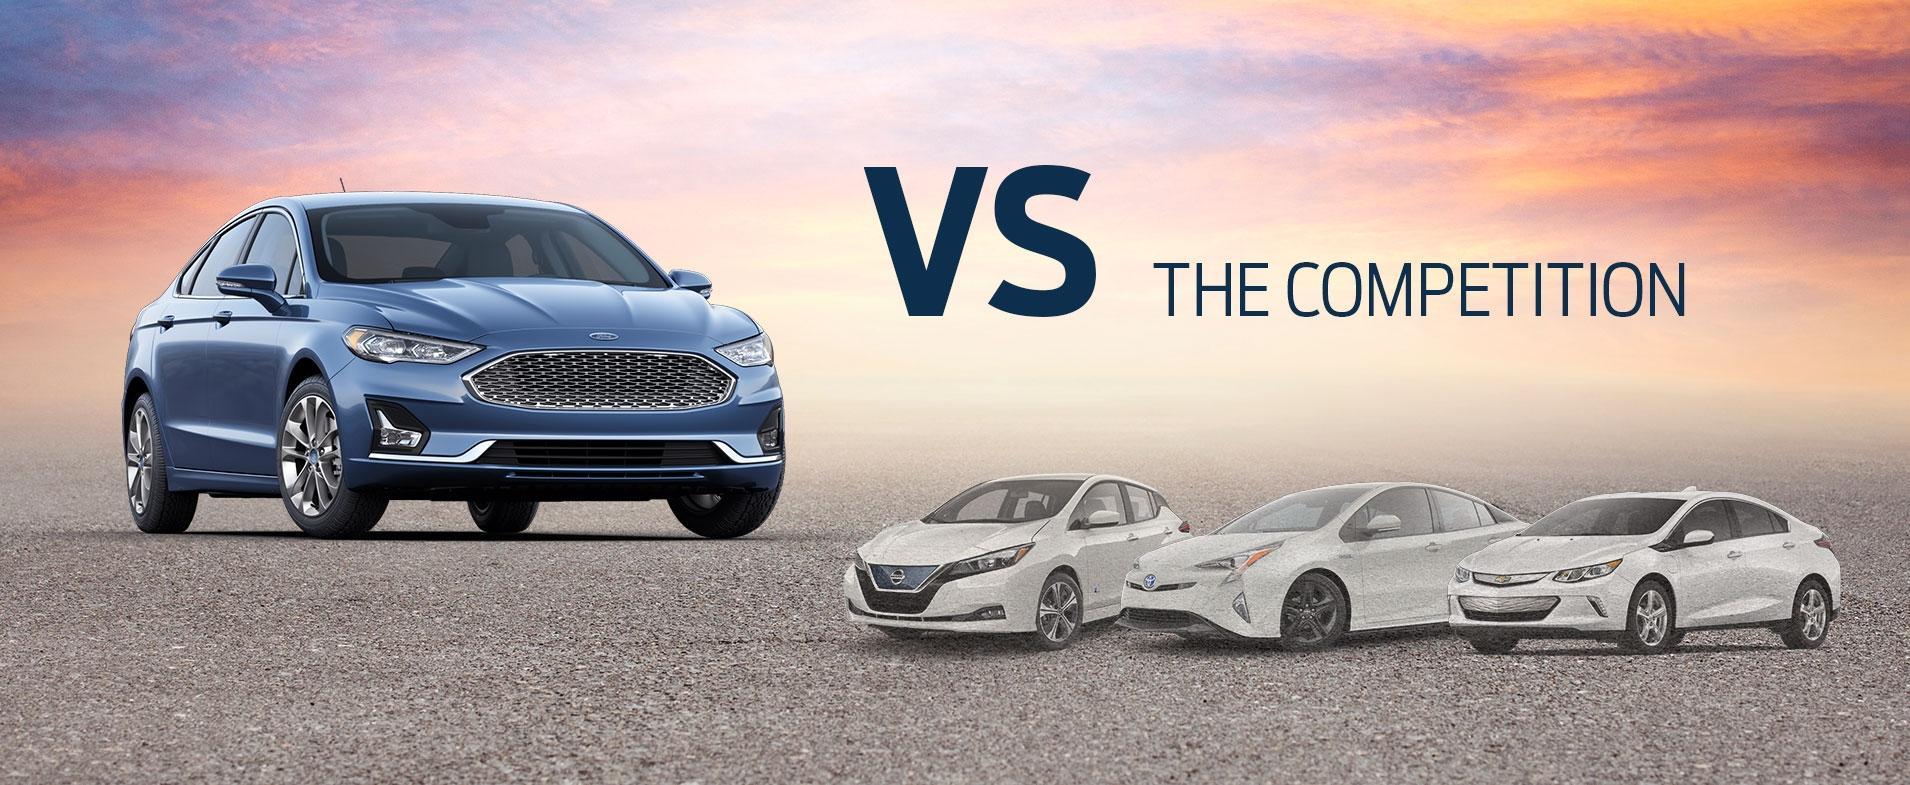 Fusion Energi vs Competition